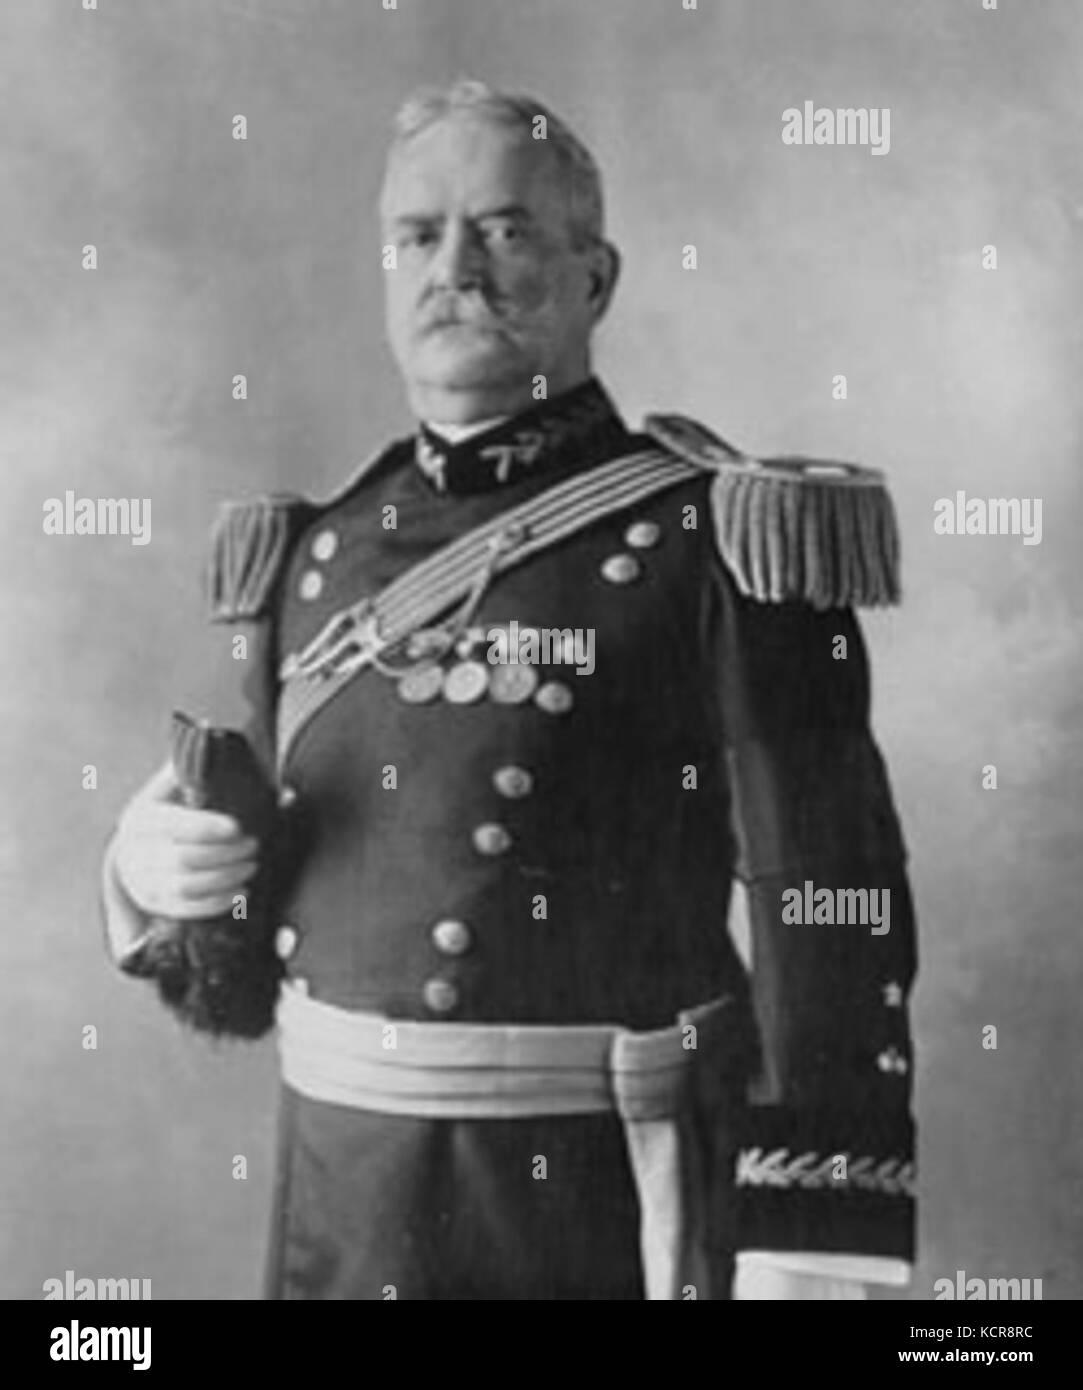 Brigadier General George P Scriven Us Army In Full Dress Uniform